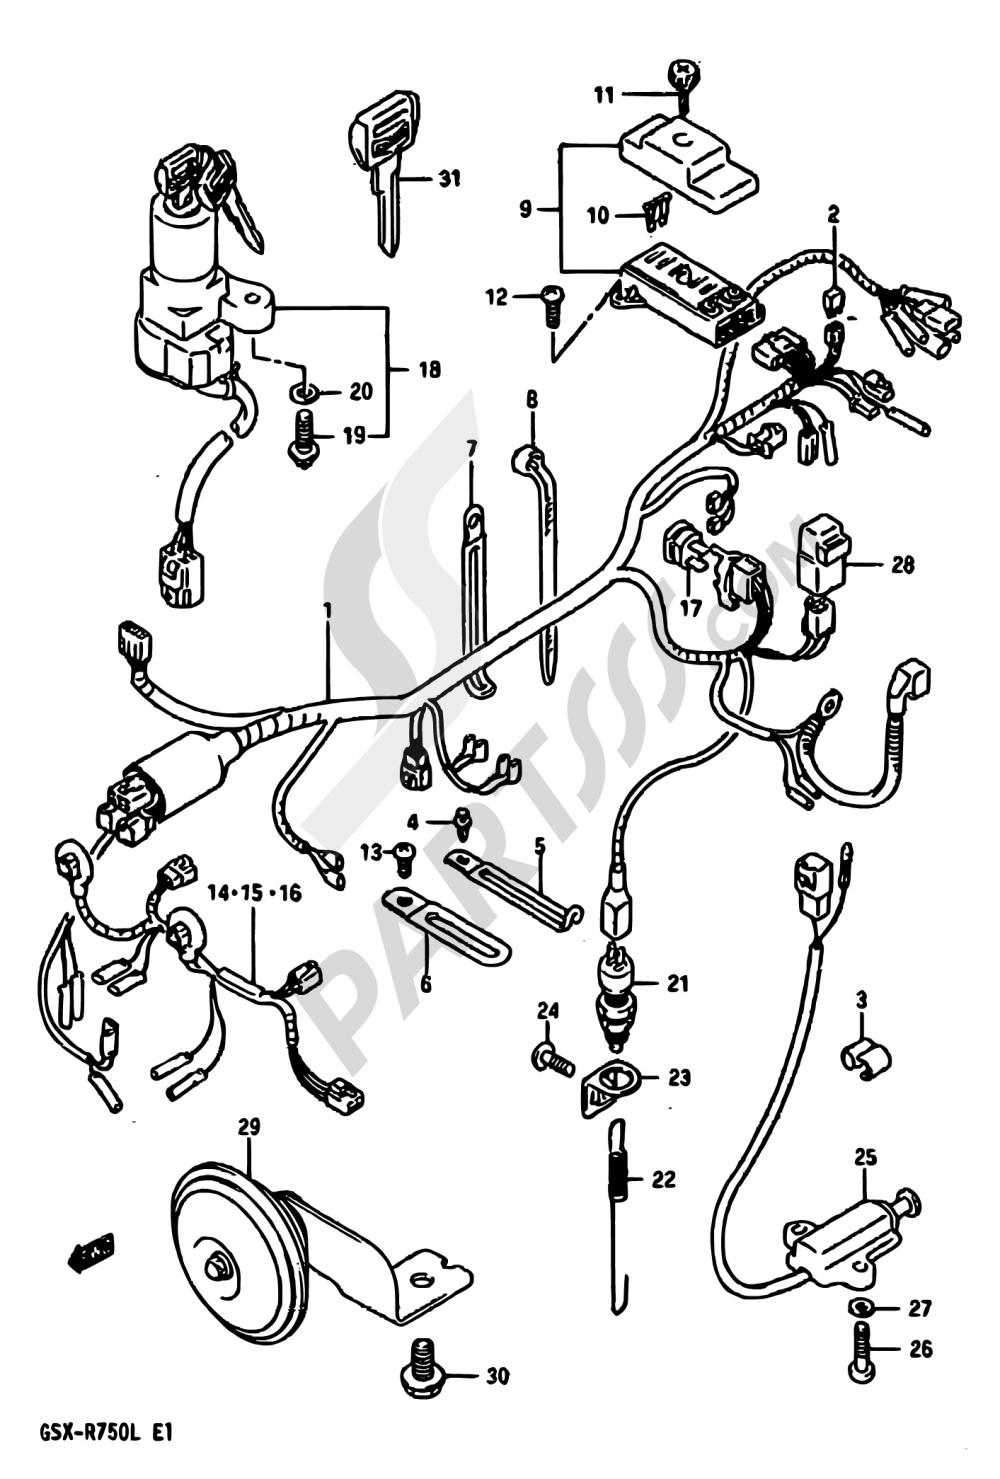 Diagram Also Suzuki Gsx R 750 Wiring Diagram As Well As Wiring